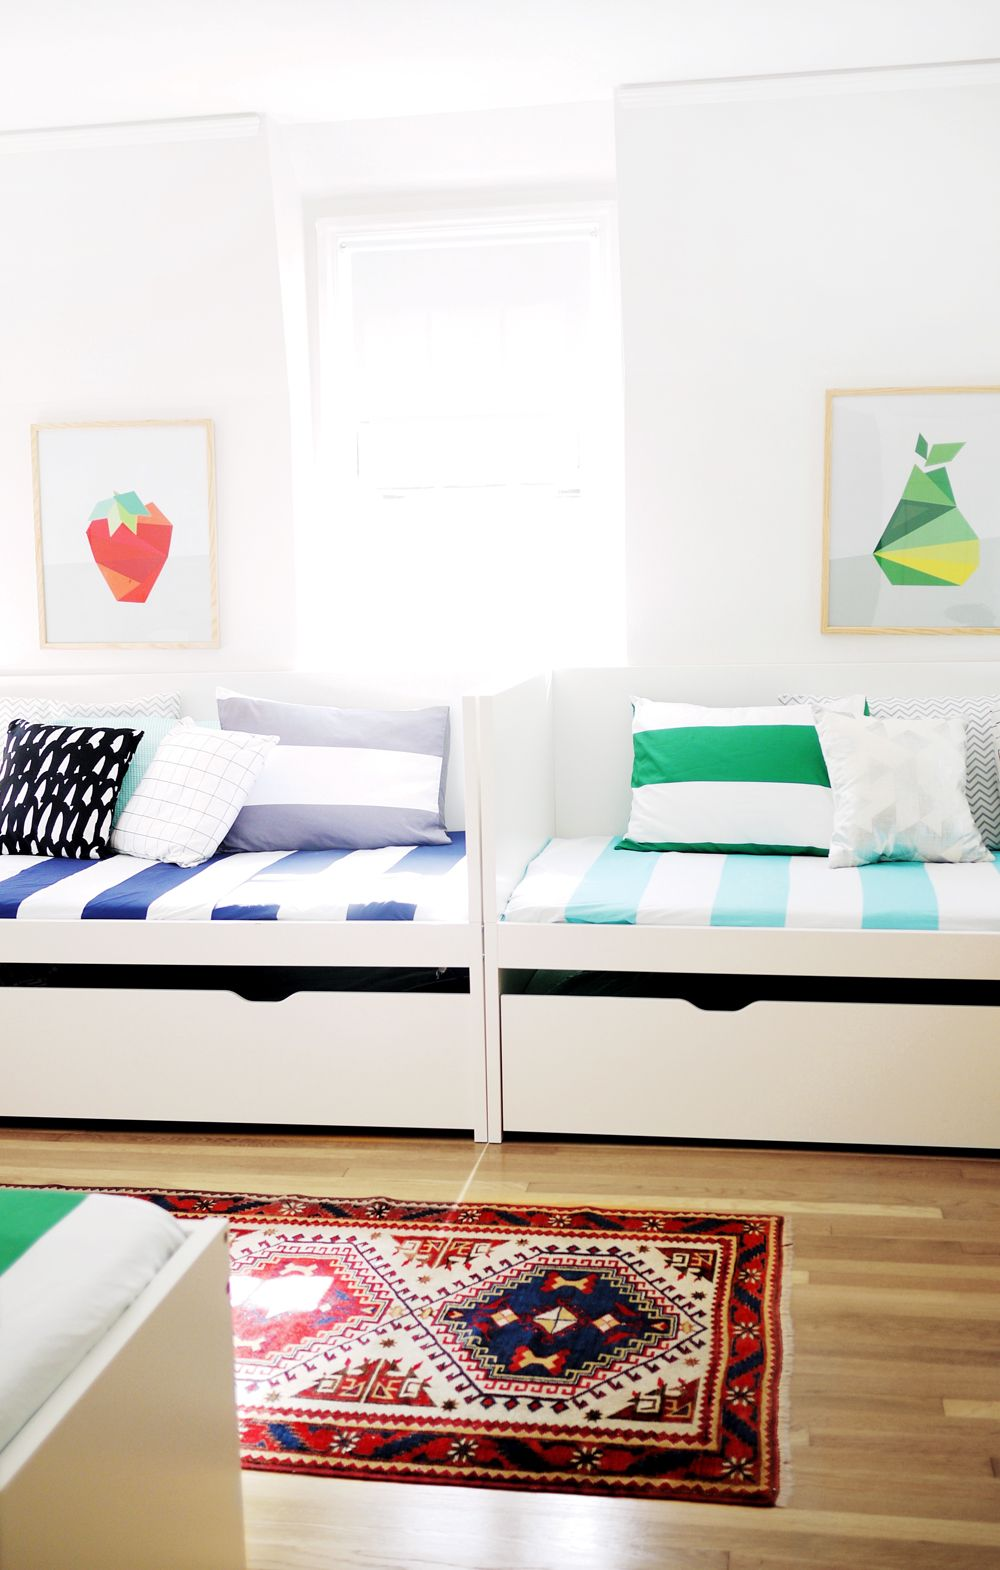 7 Bedroom House For Rent: A Shared Bedroom For Seven Grandkids